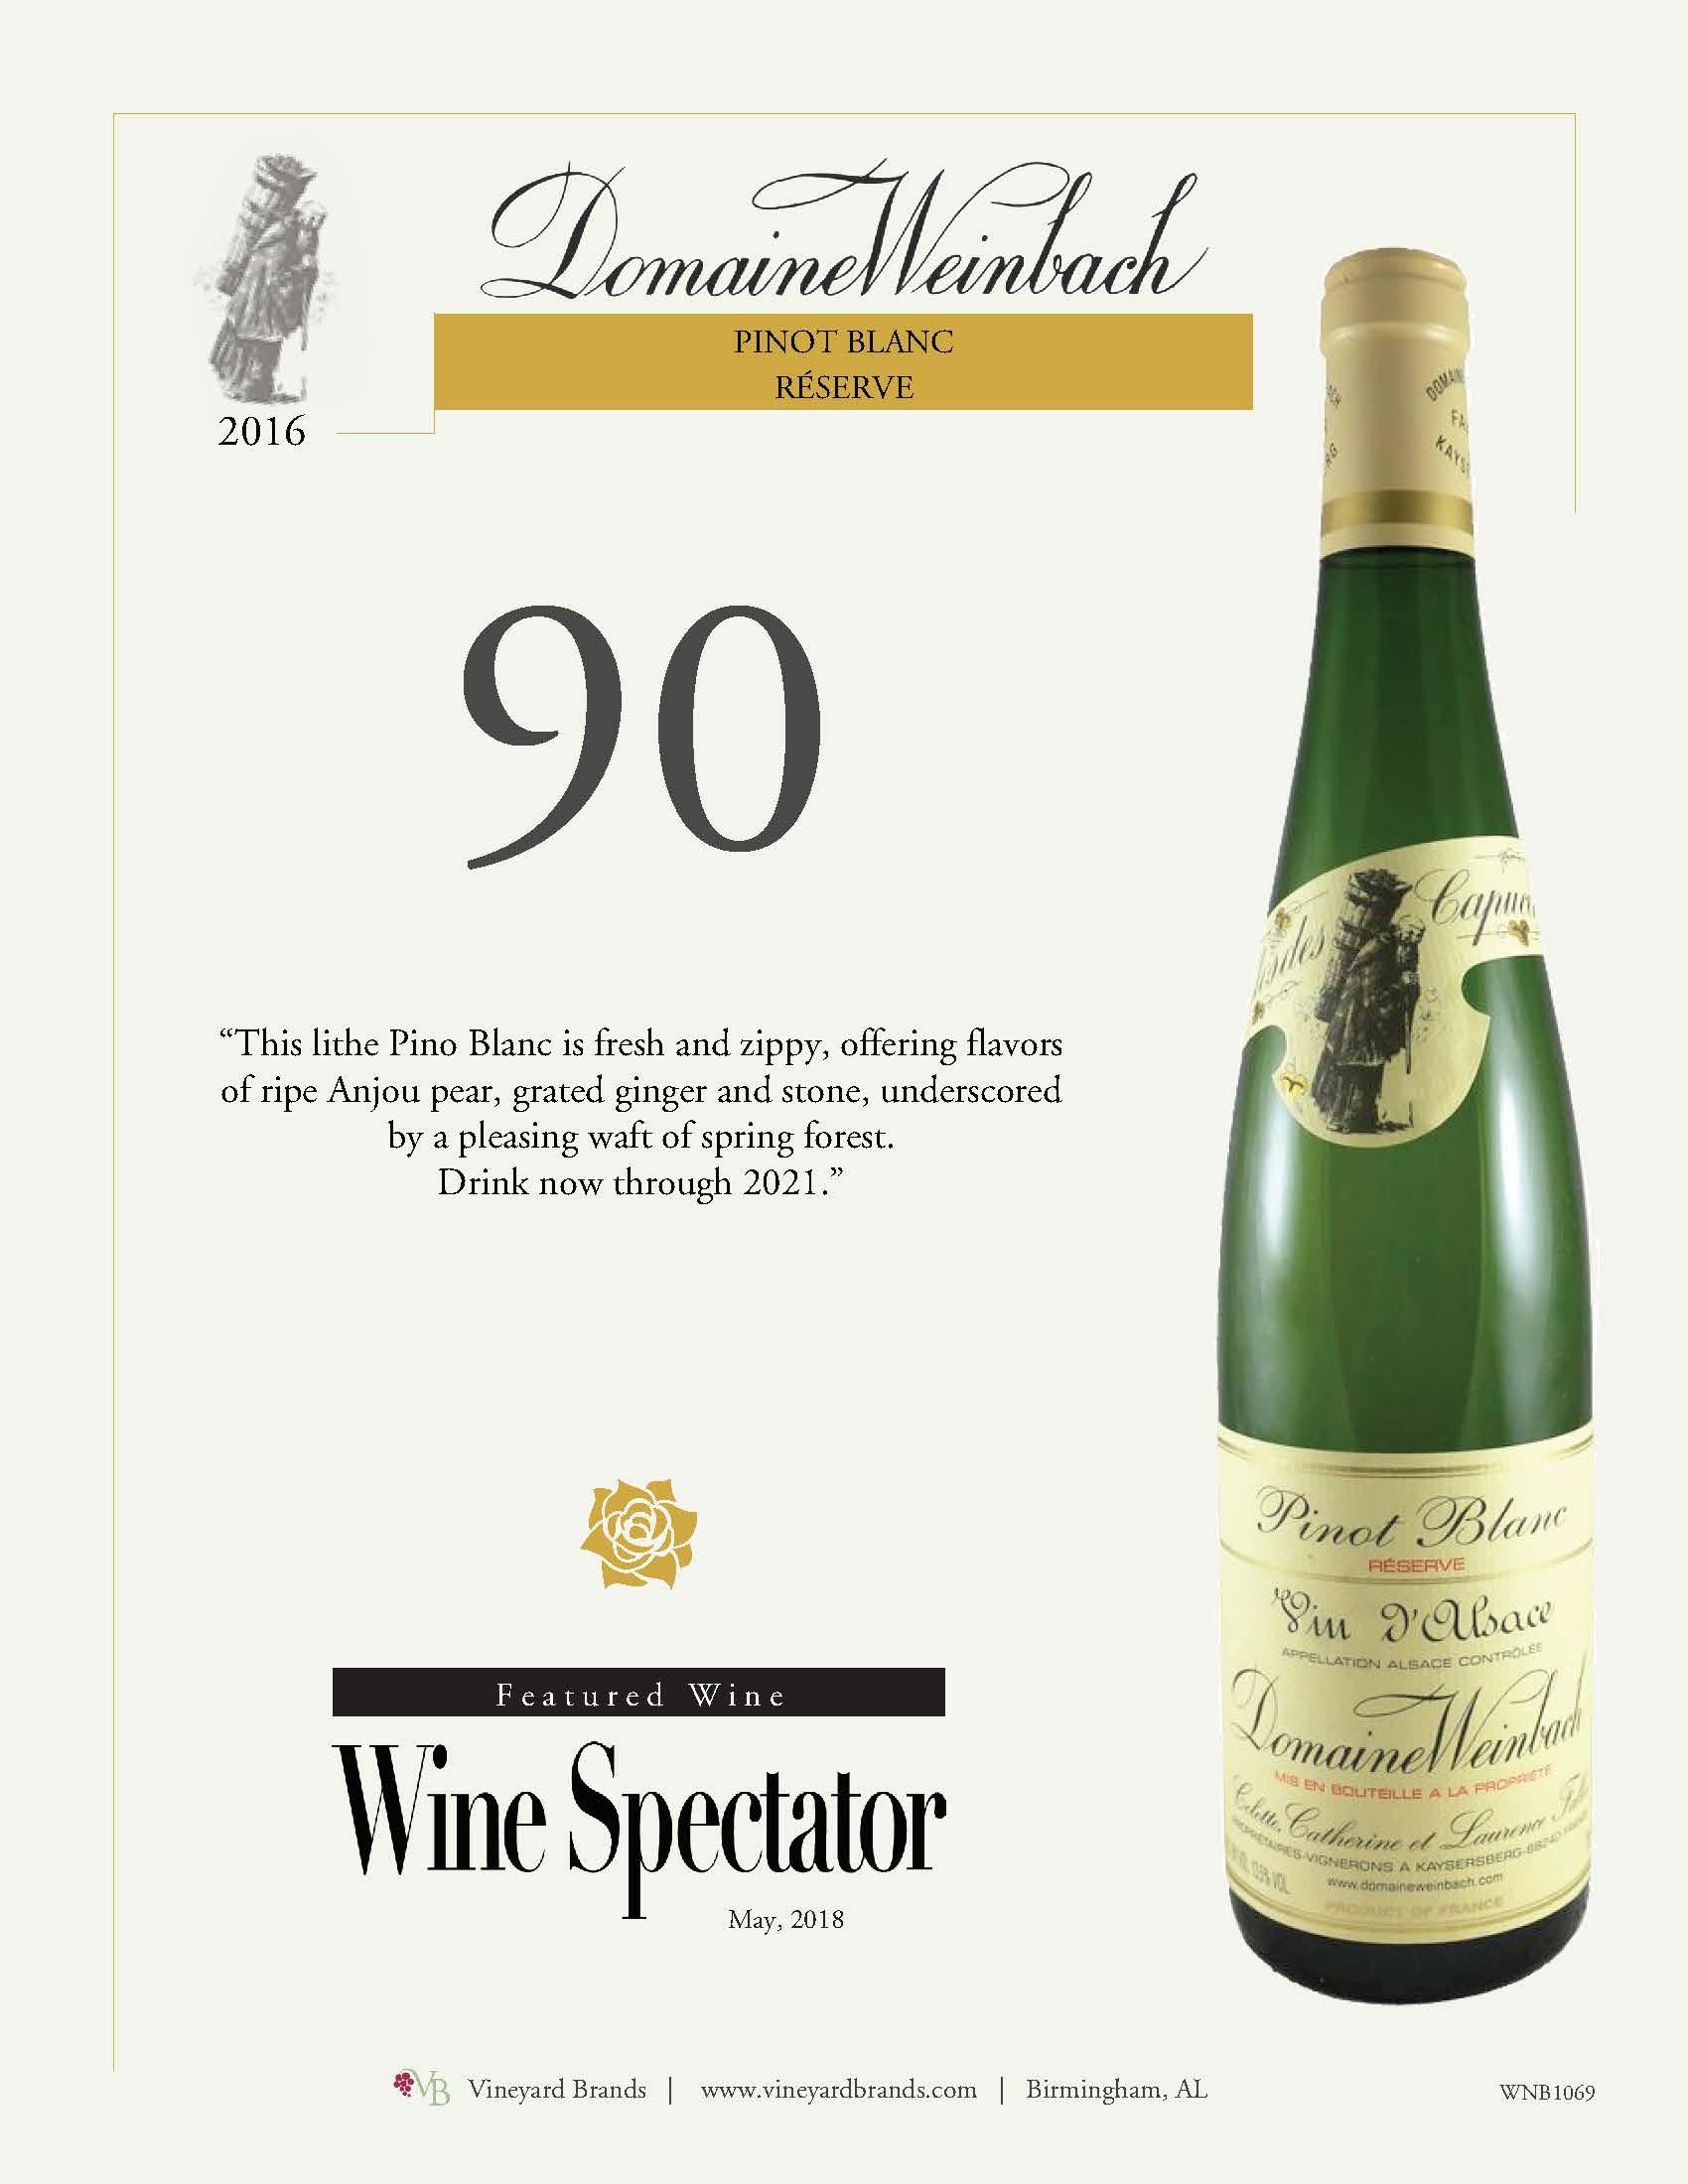 Weinbach Pinot Blanc Reserve.jpg